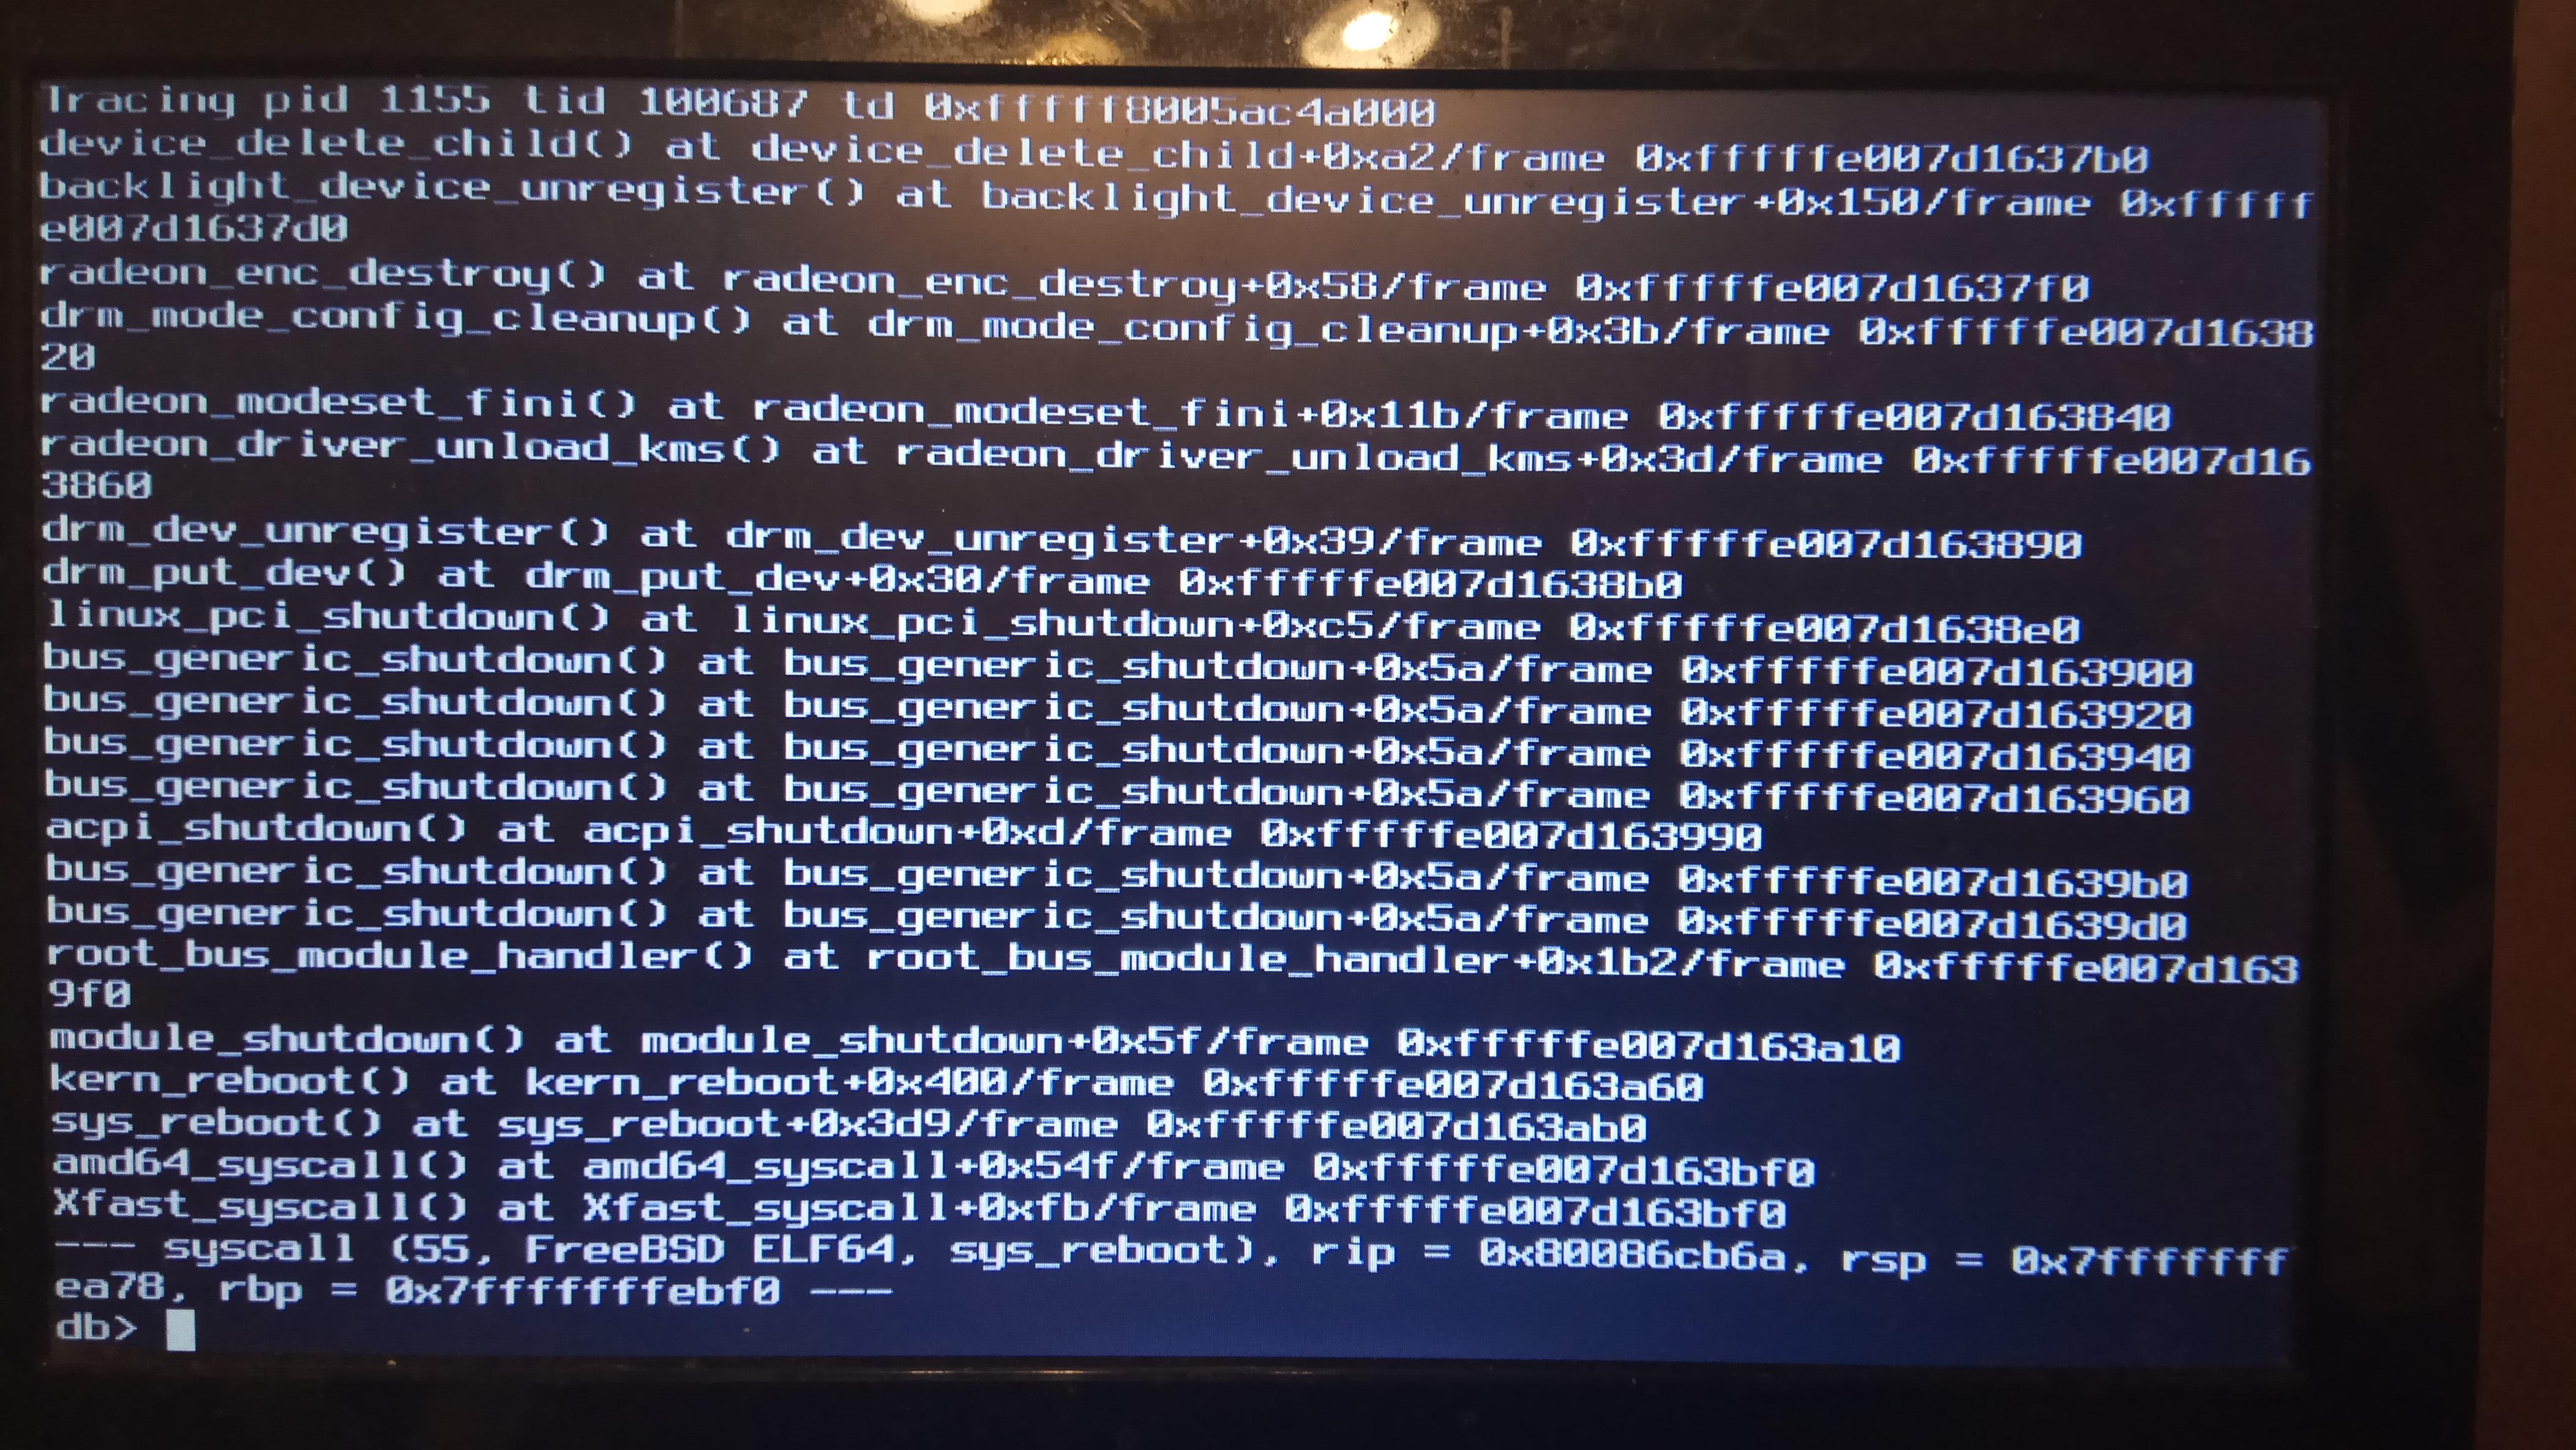 graphics/drm-next-kmod: /boot/modules/radeonkms ko can not